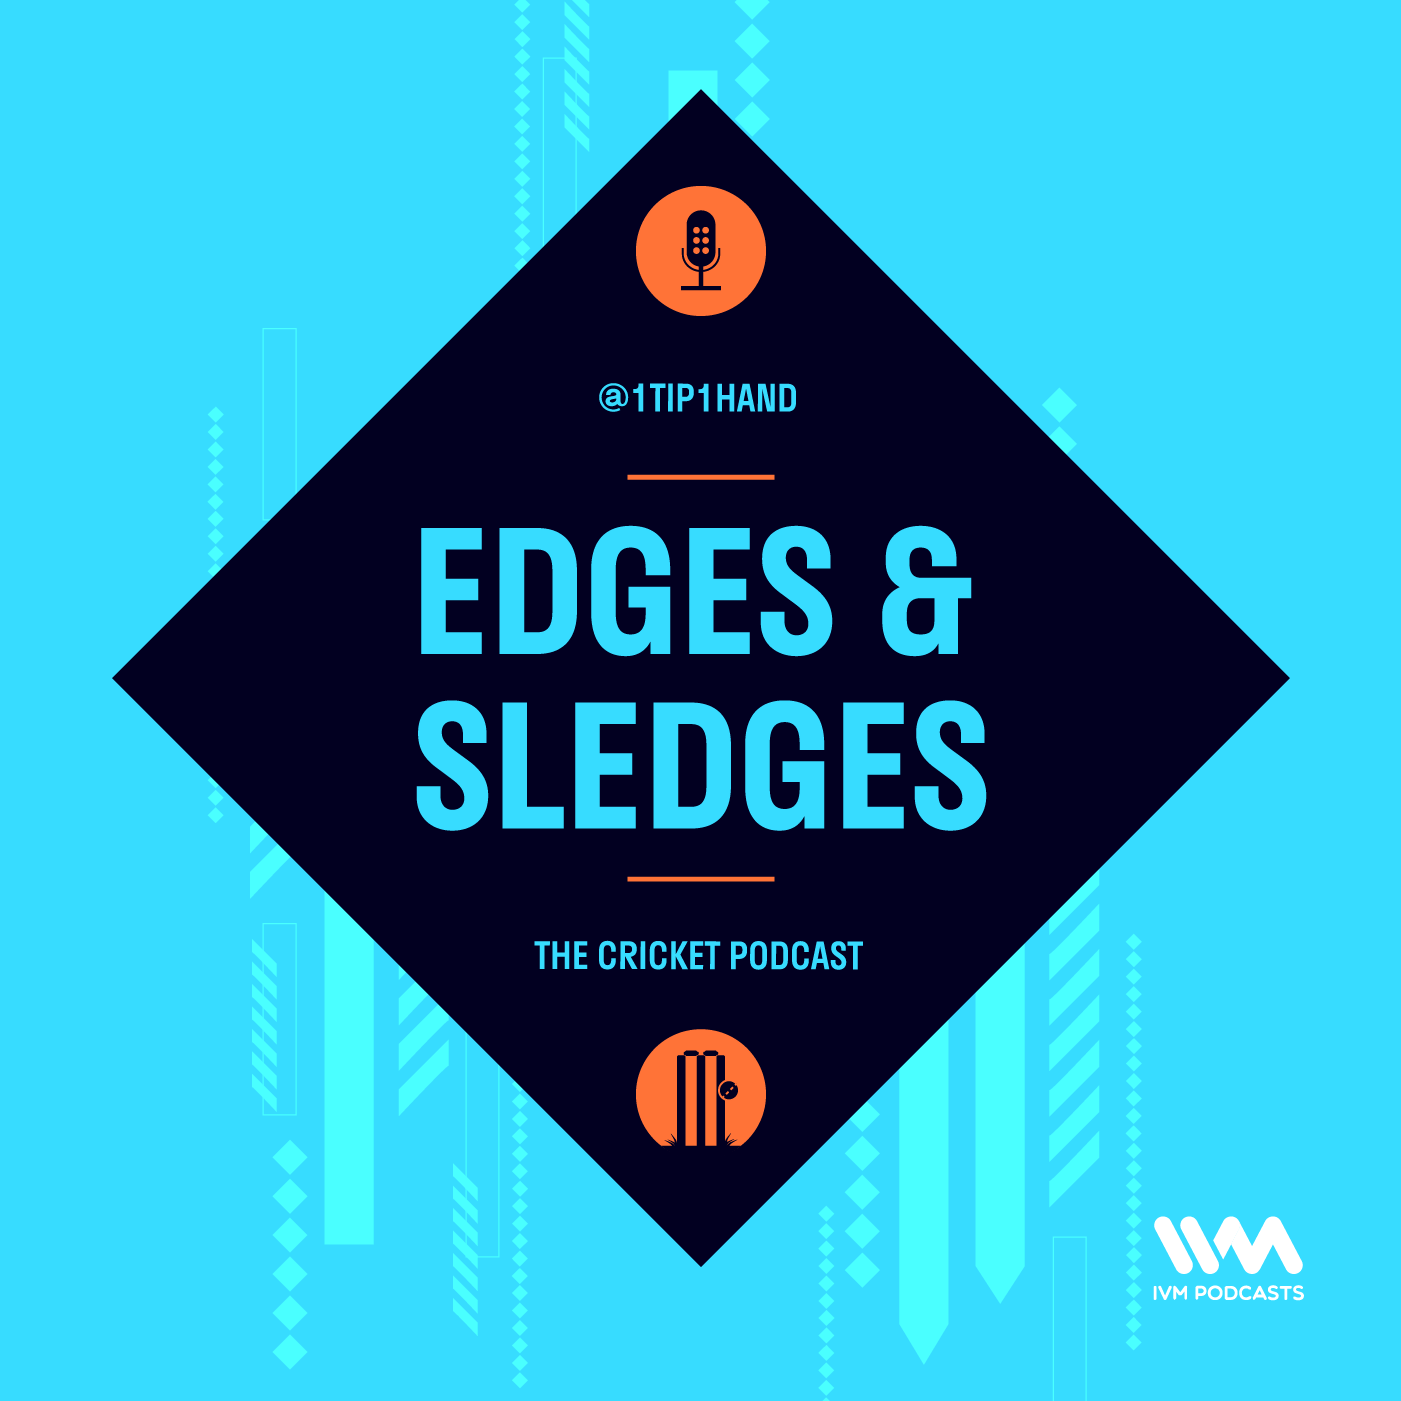 The Edges & Sledges Cricket Podcast |